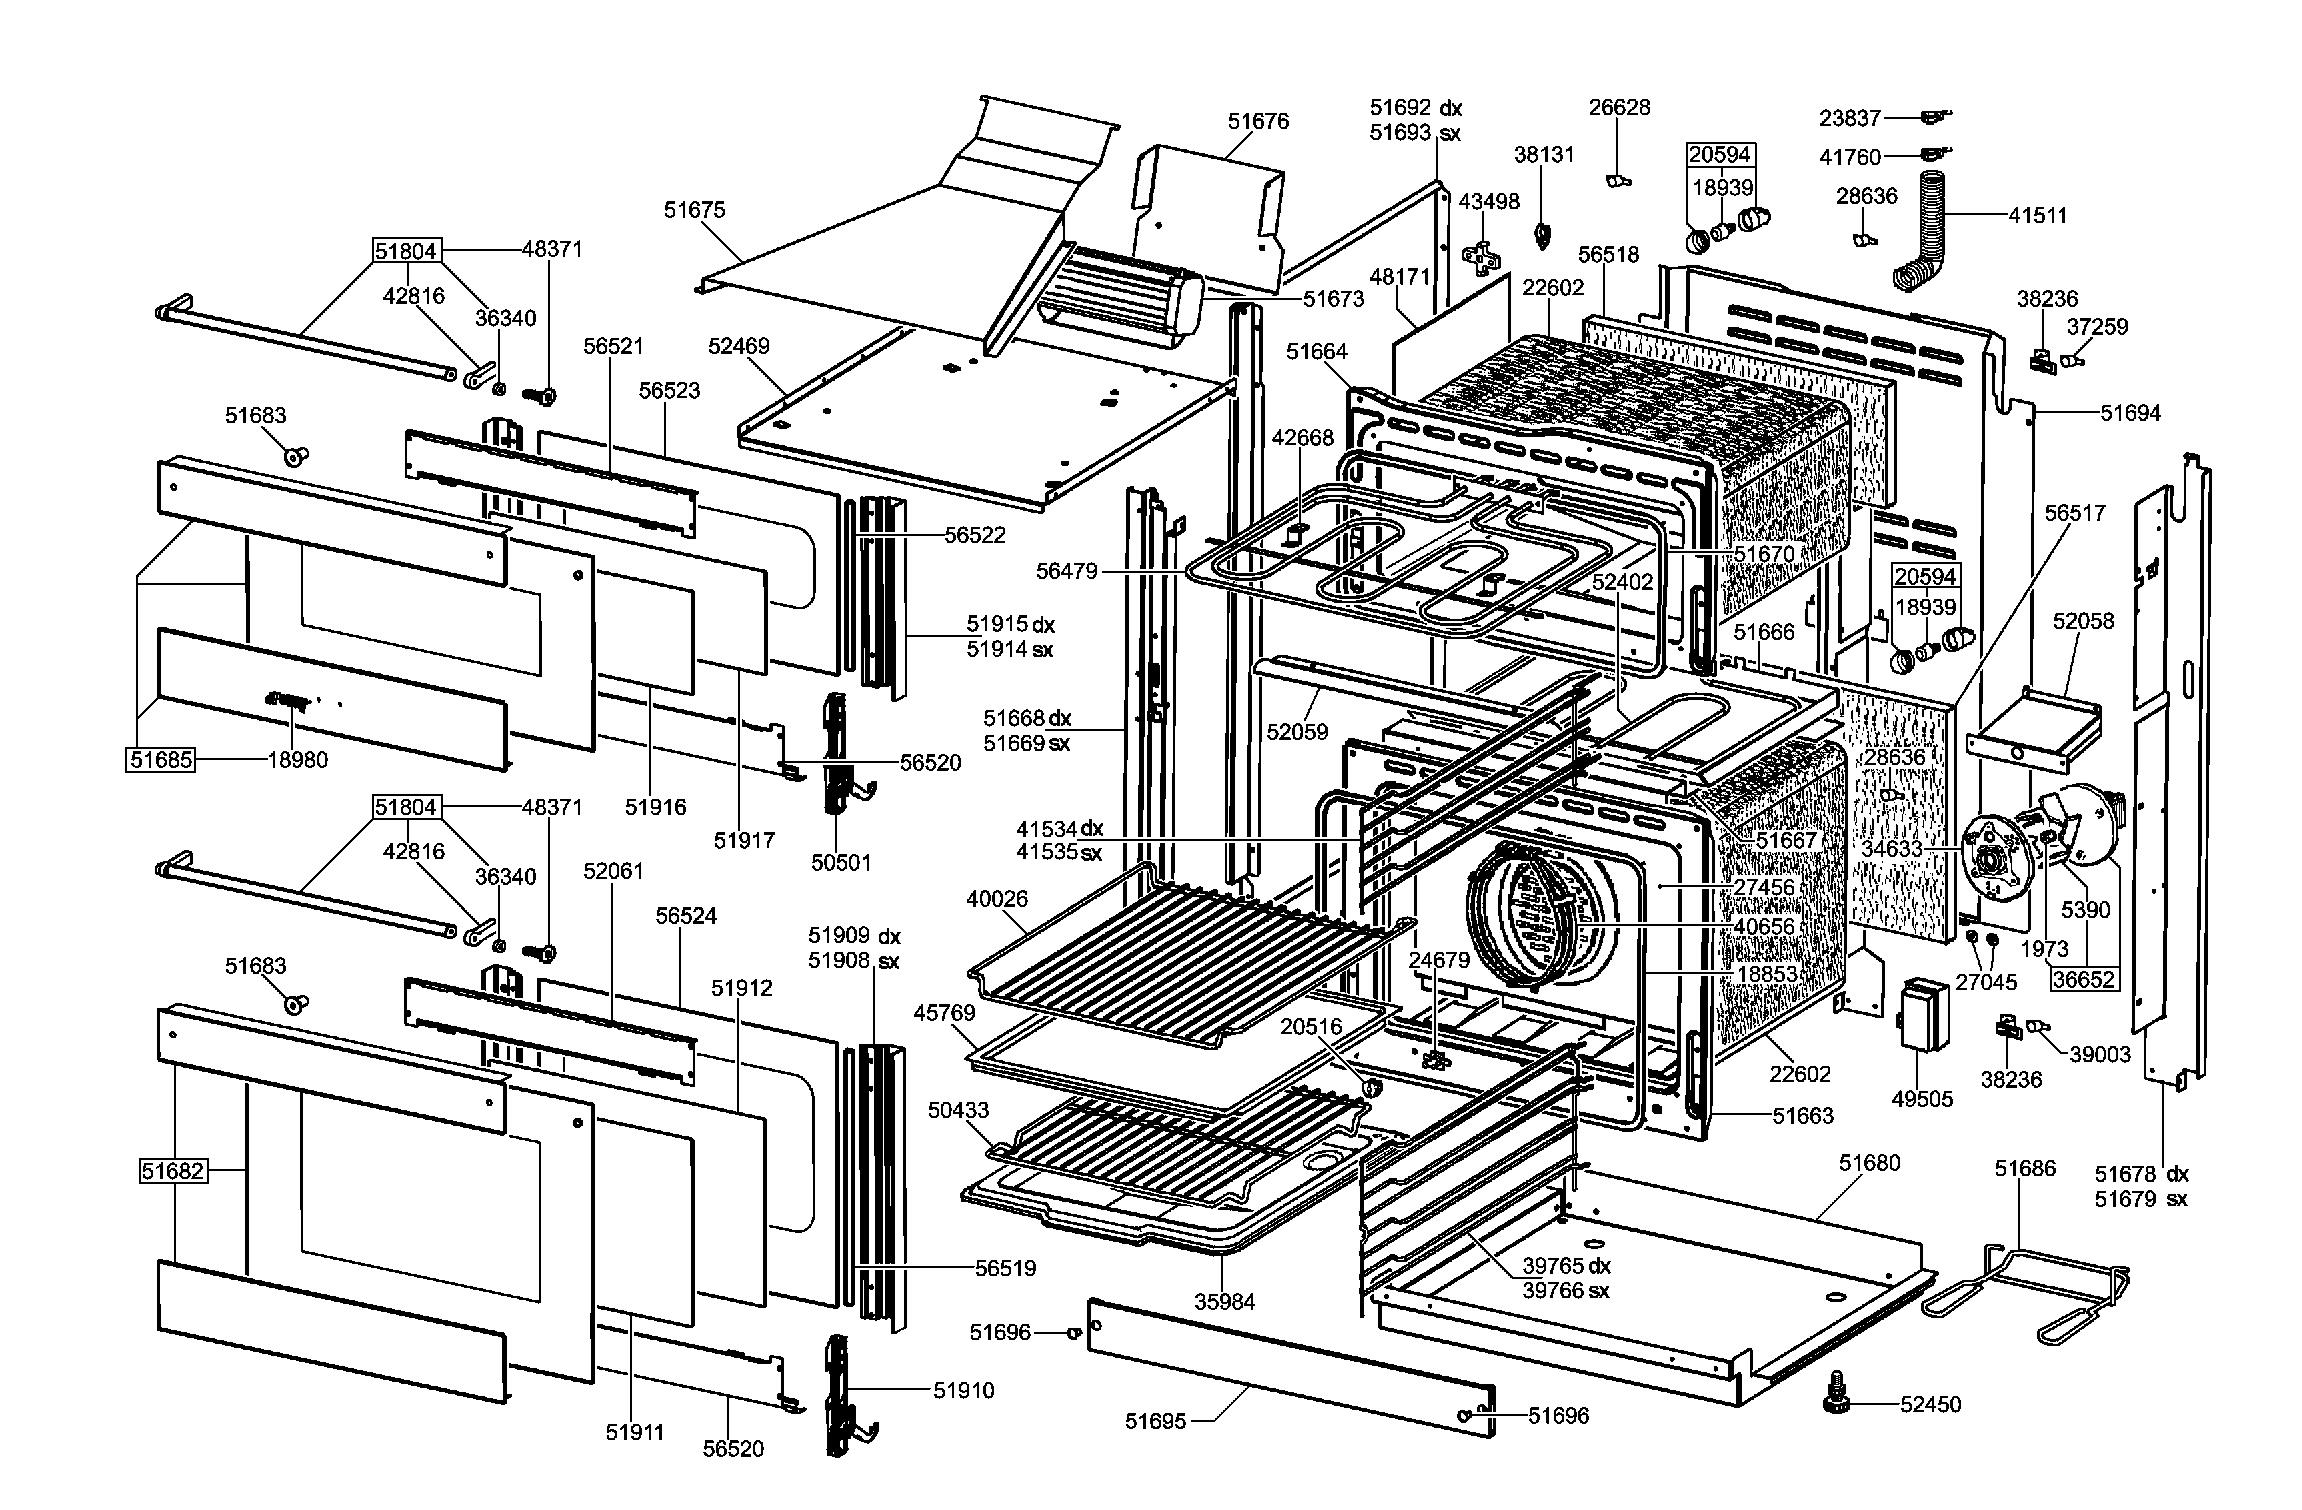 smeg double oven wiring diagram 2000 jeep cherokee xj stereo 6io lektionenderliebe de range manual e books rh 15 made4dogs